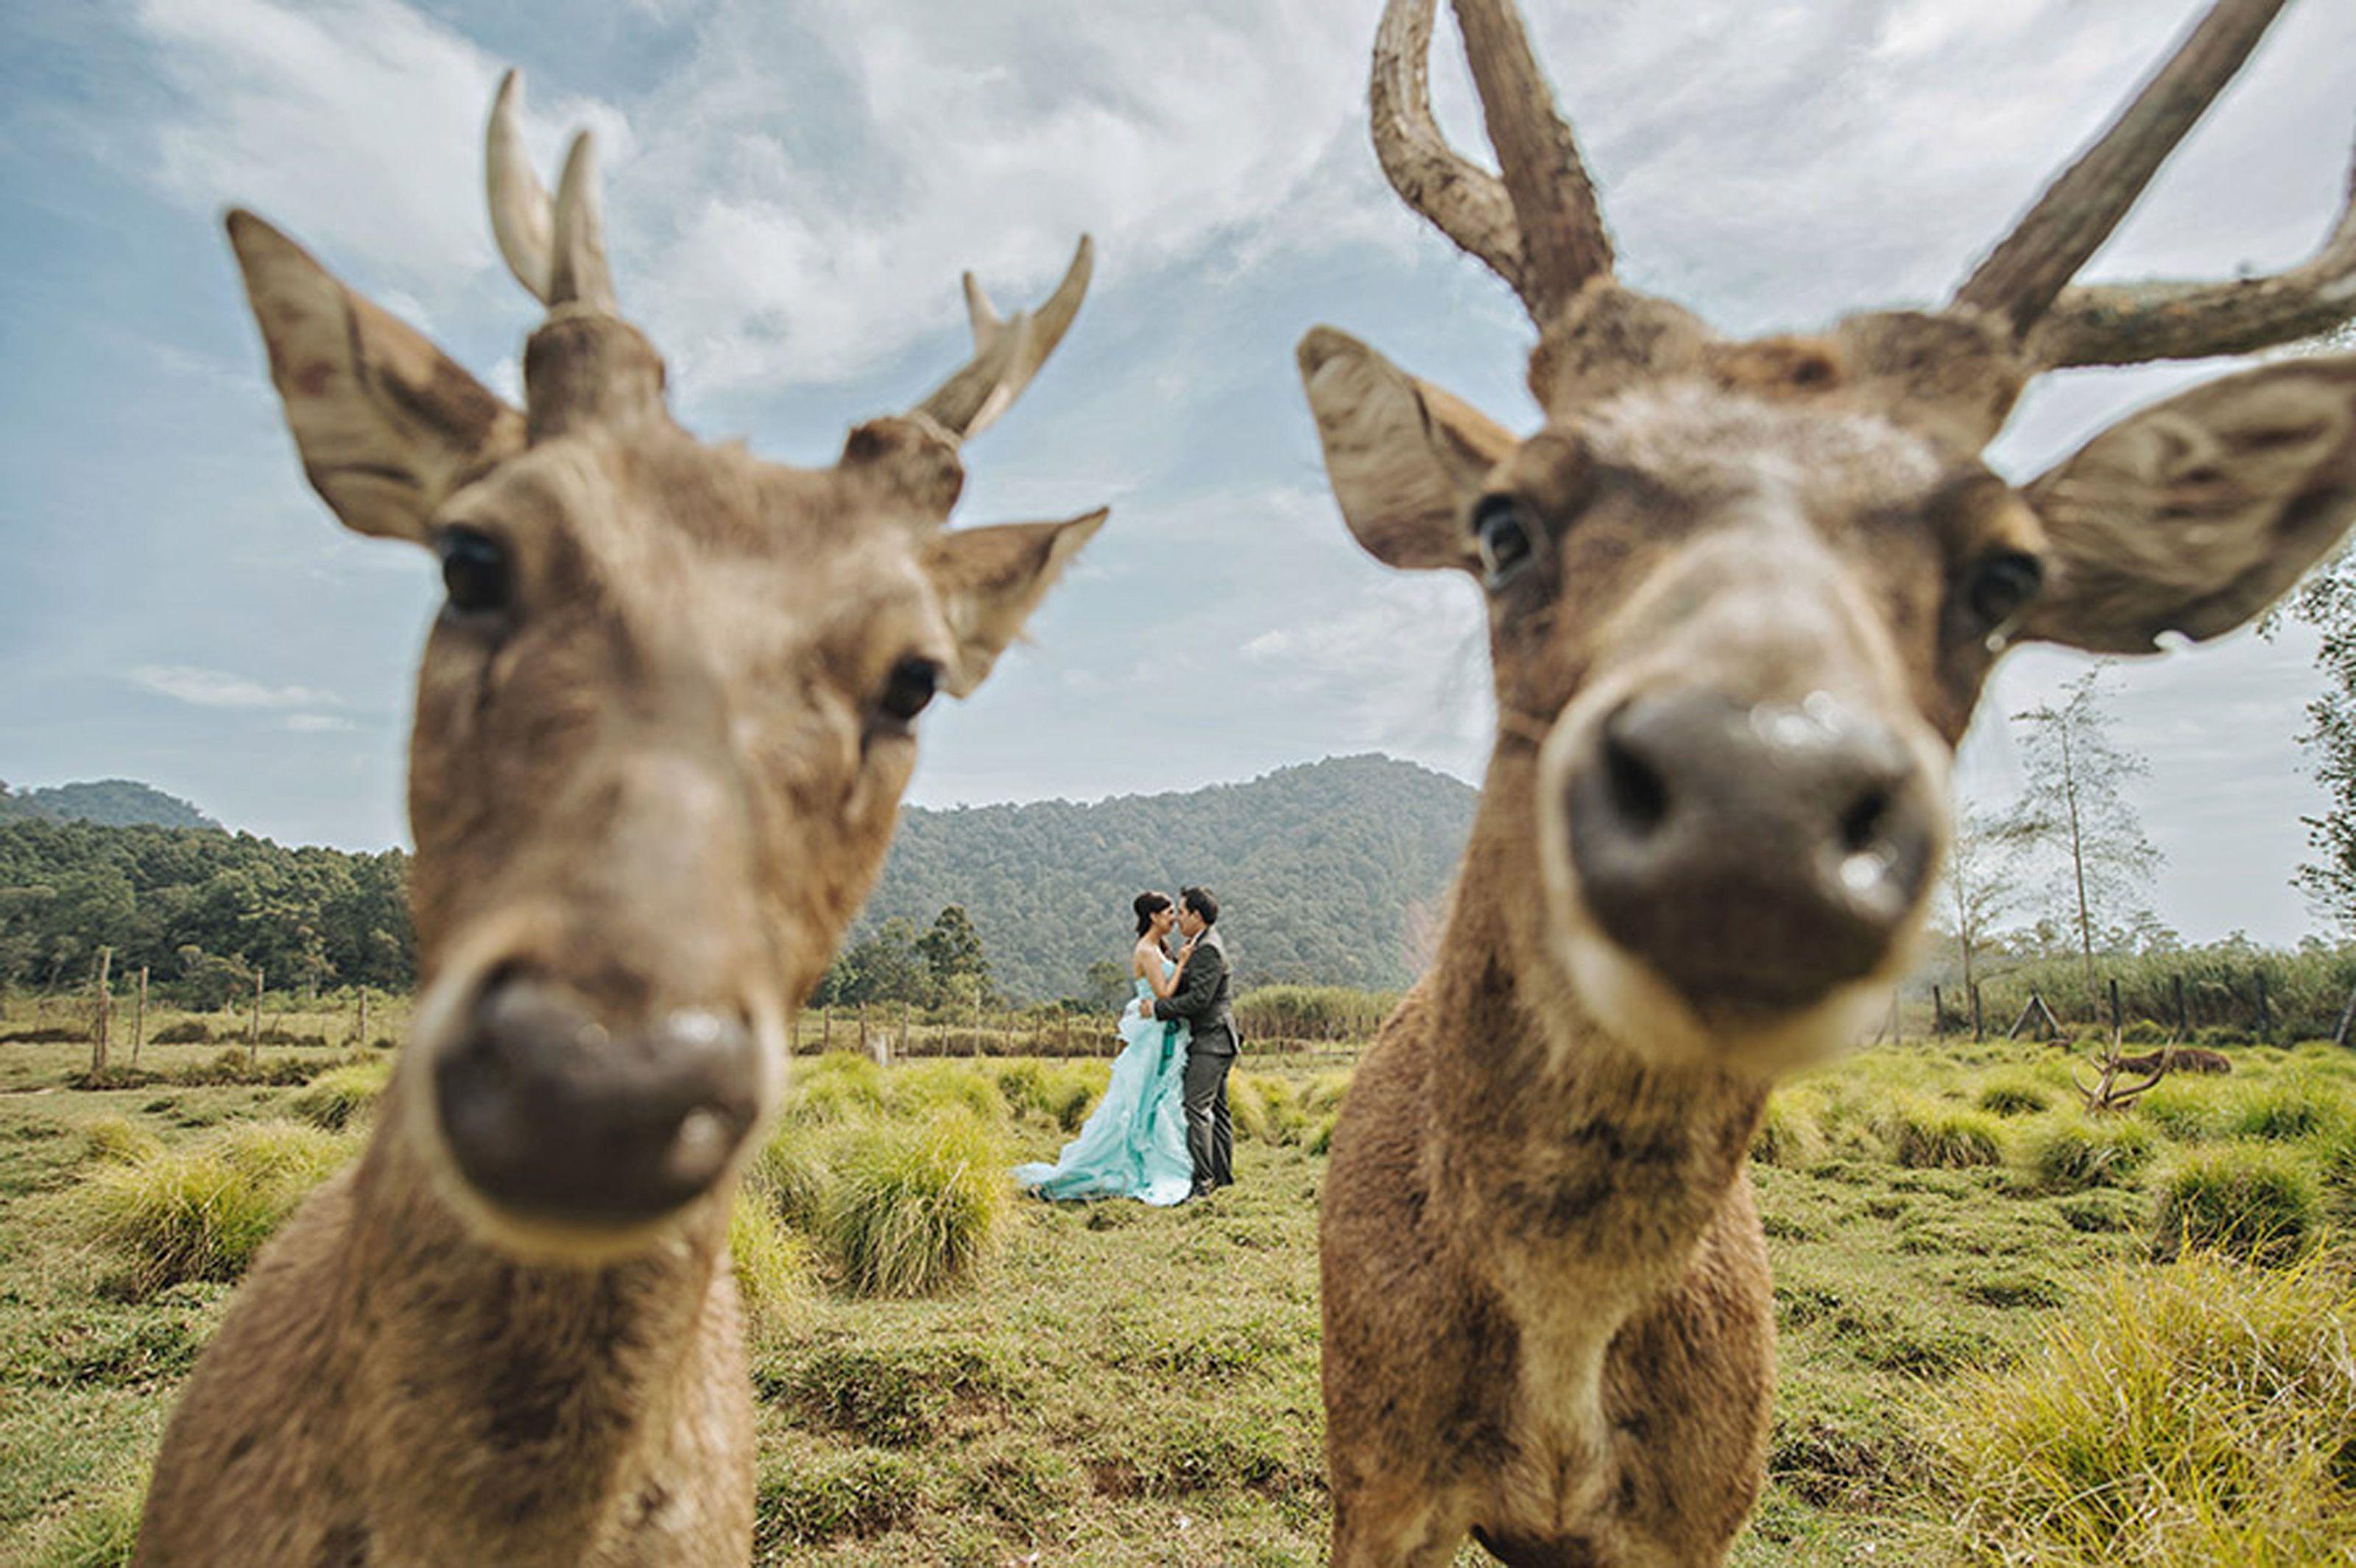 8 Hilariously Odd Wedding Photos